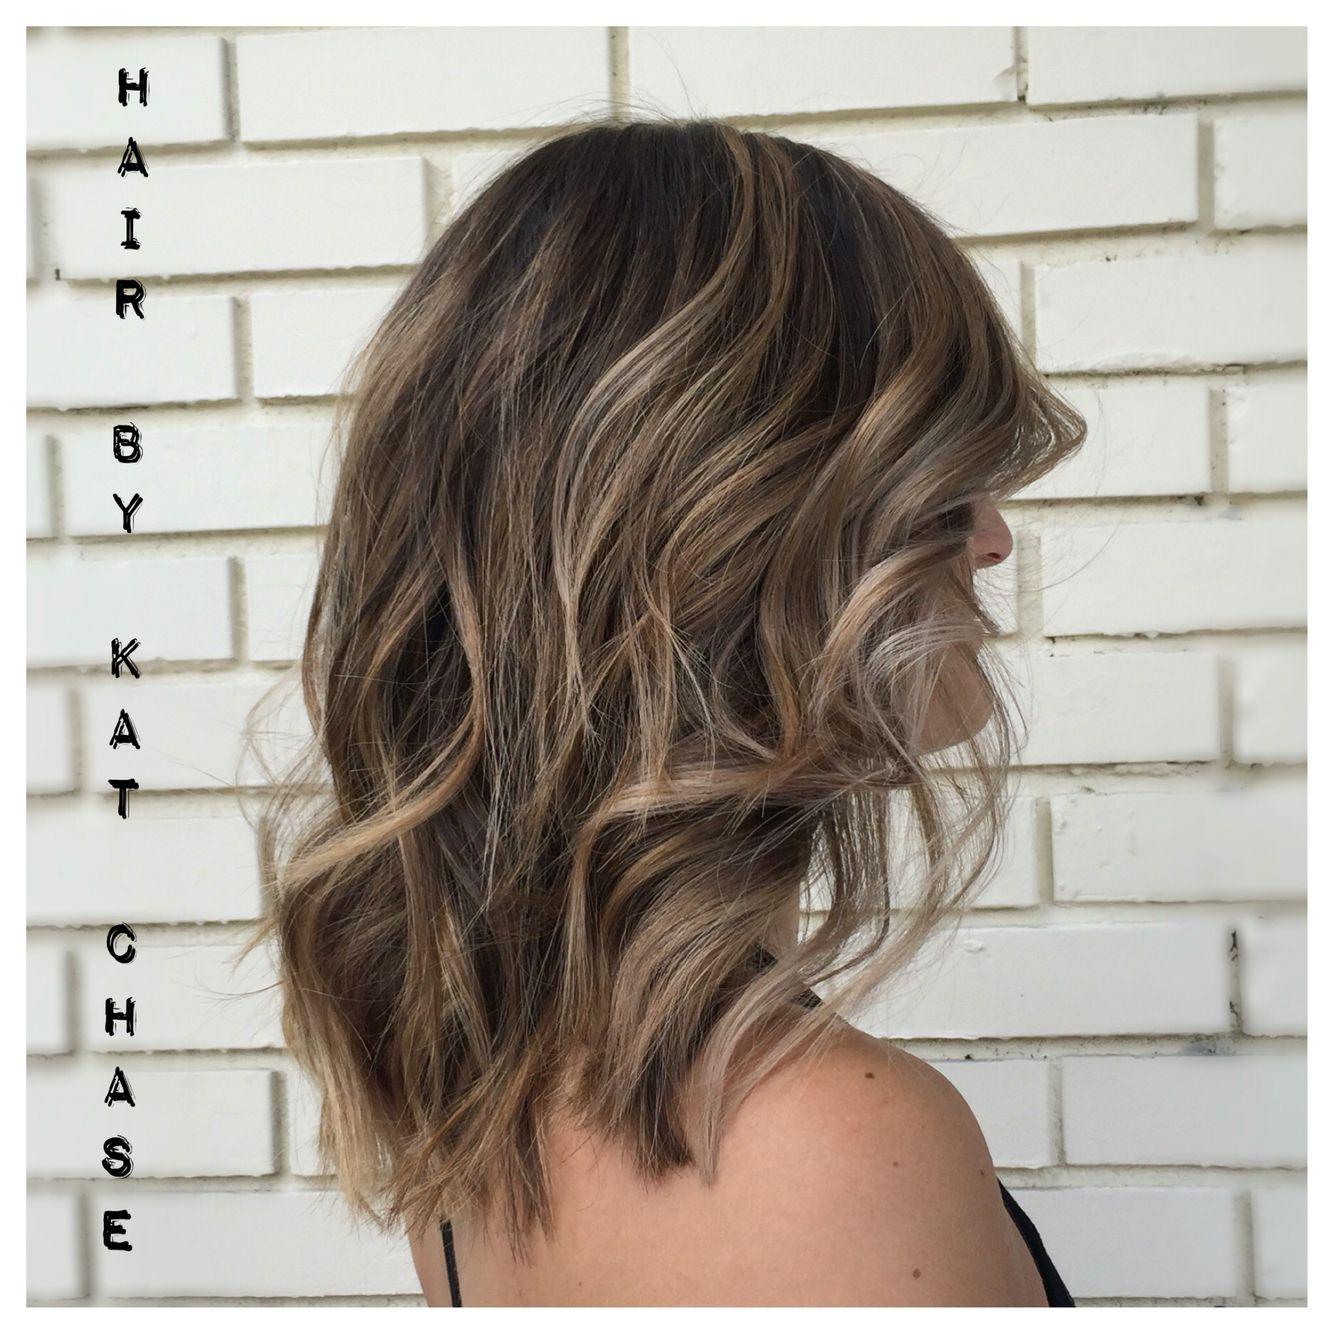 Ash blonde balayage highlights on medium hair Μαλλια pinterest